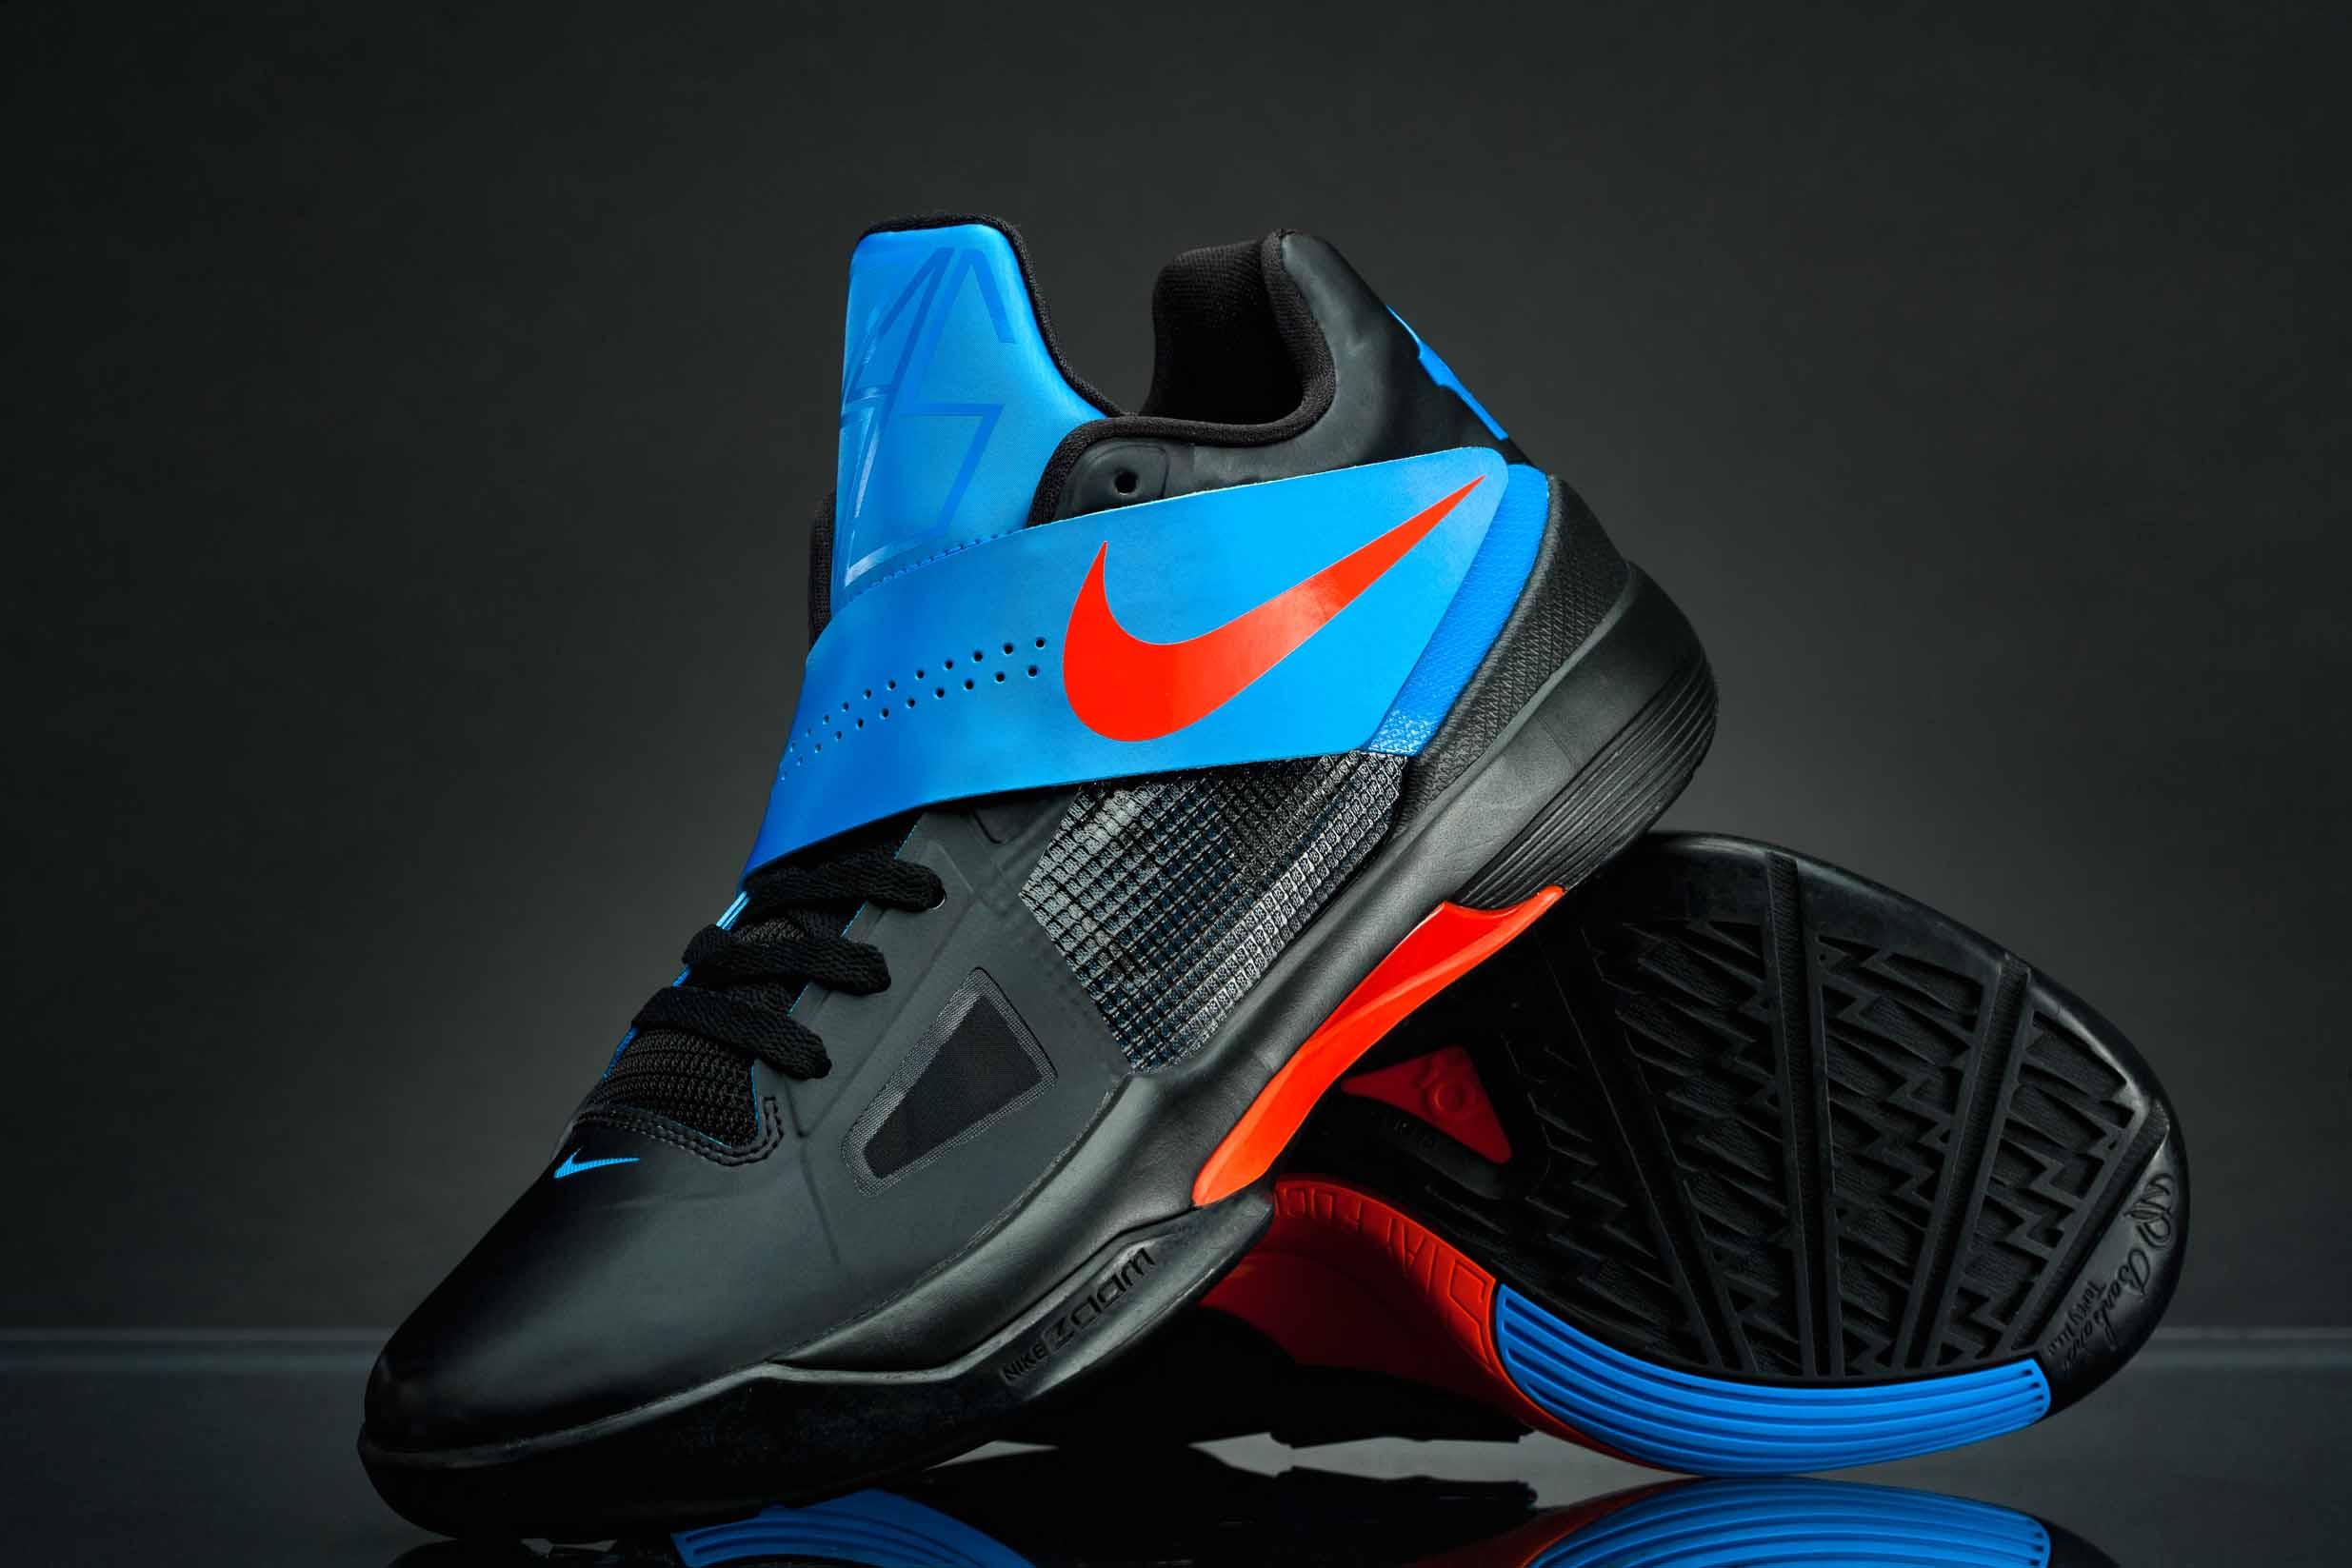 Nike Basketball Shoes Wallpaper - WallpaperSafari